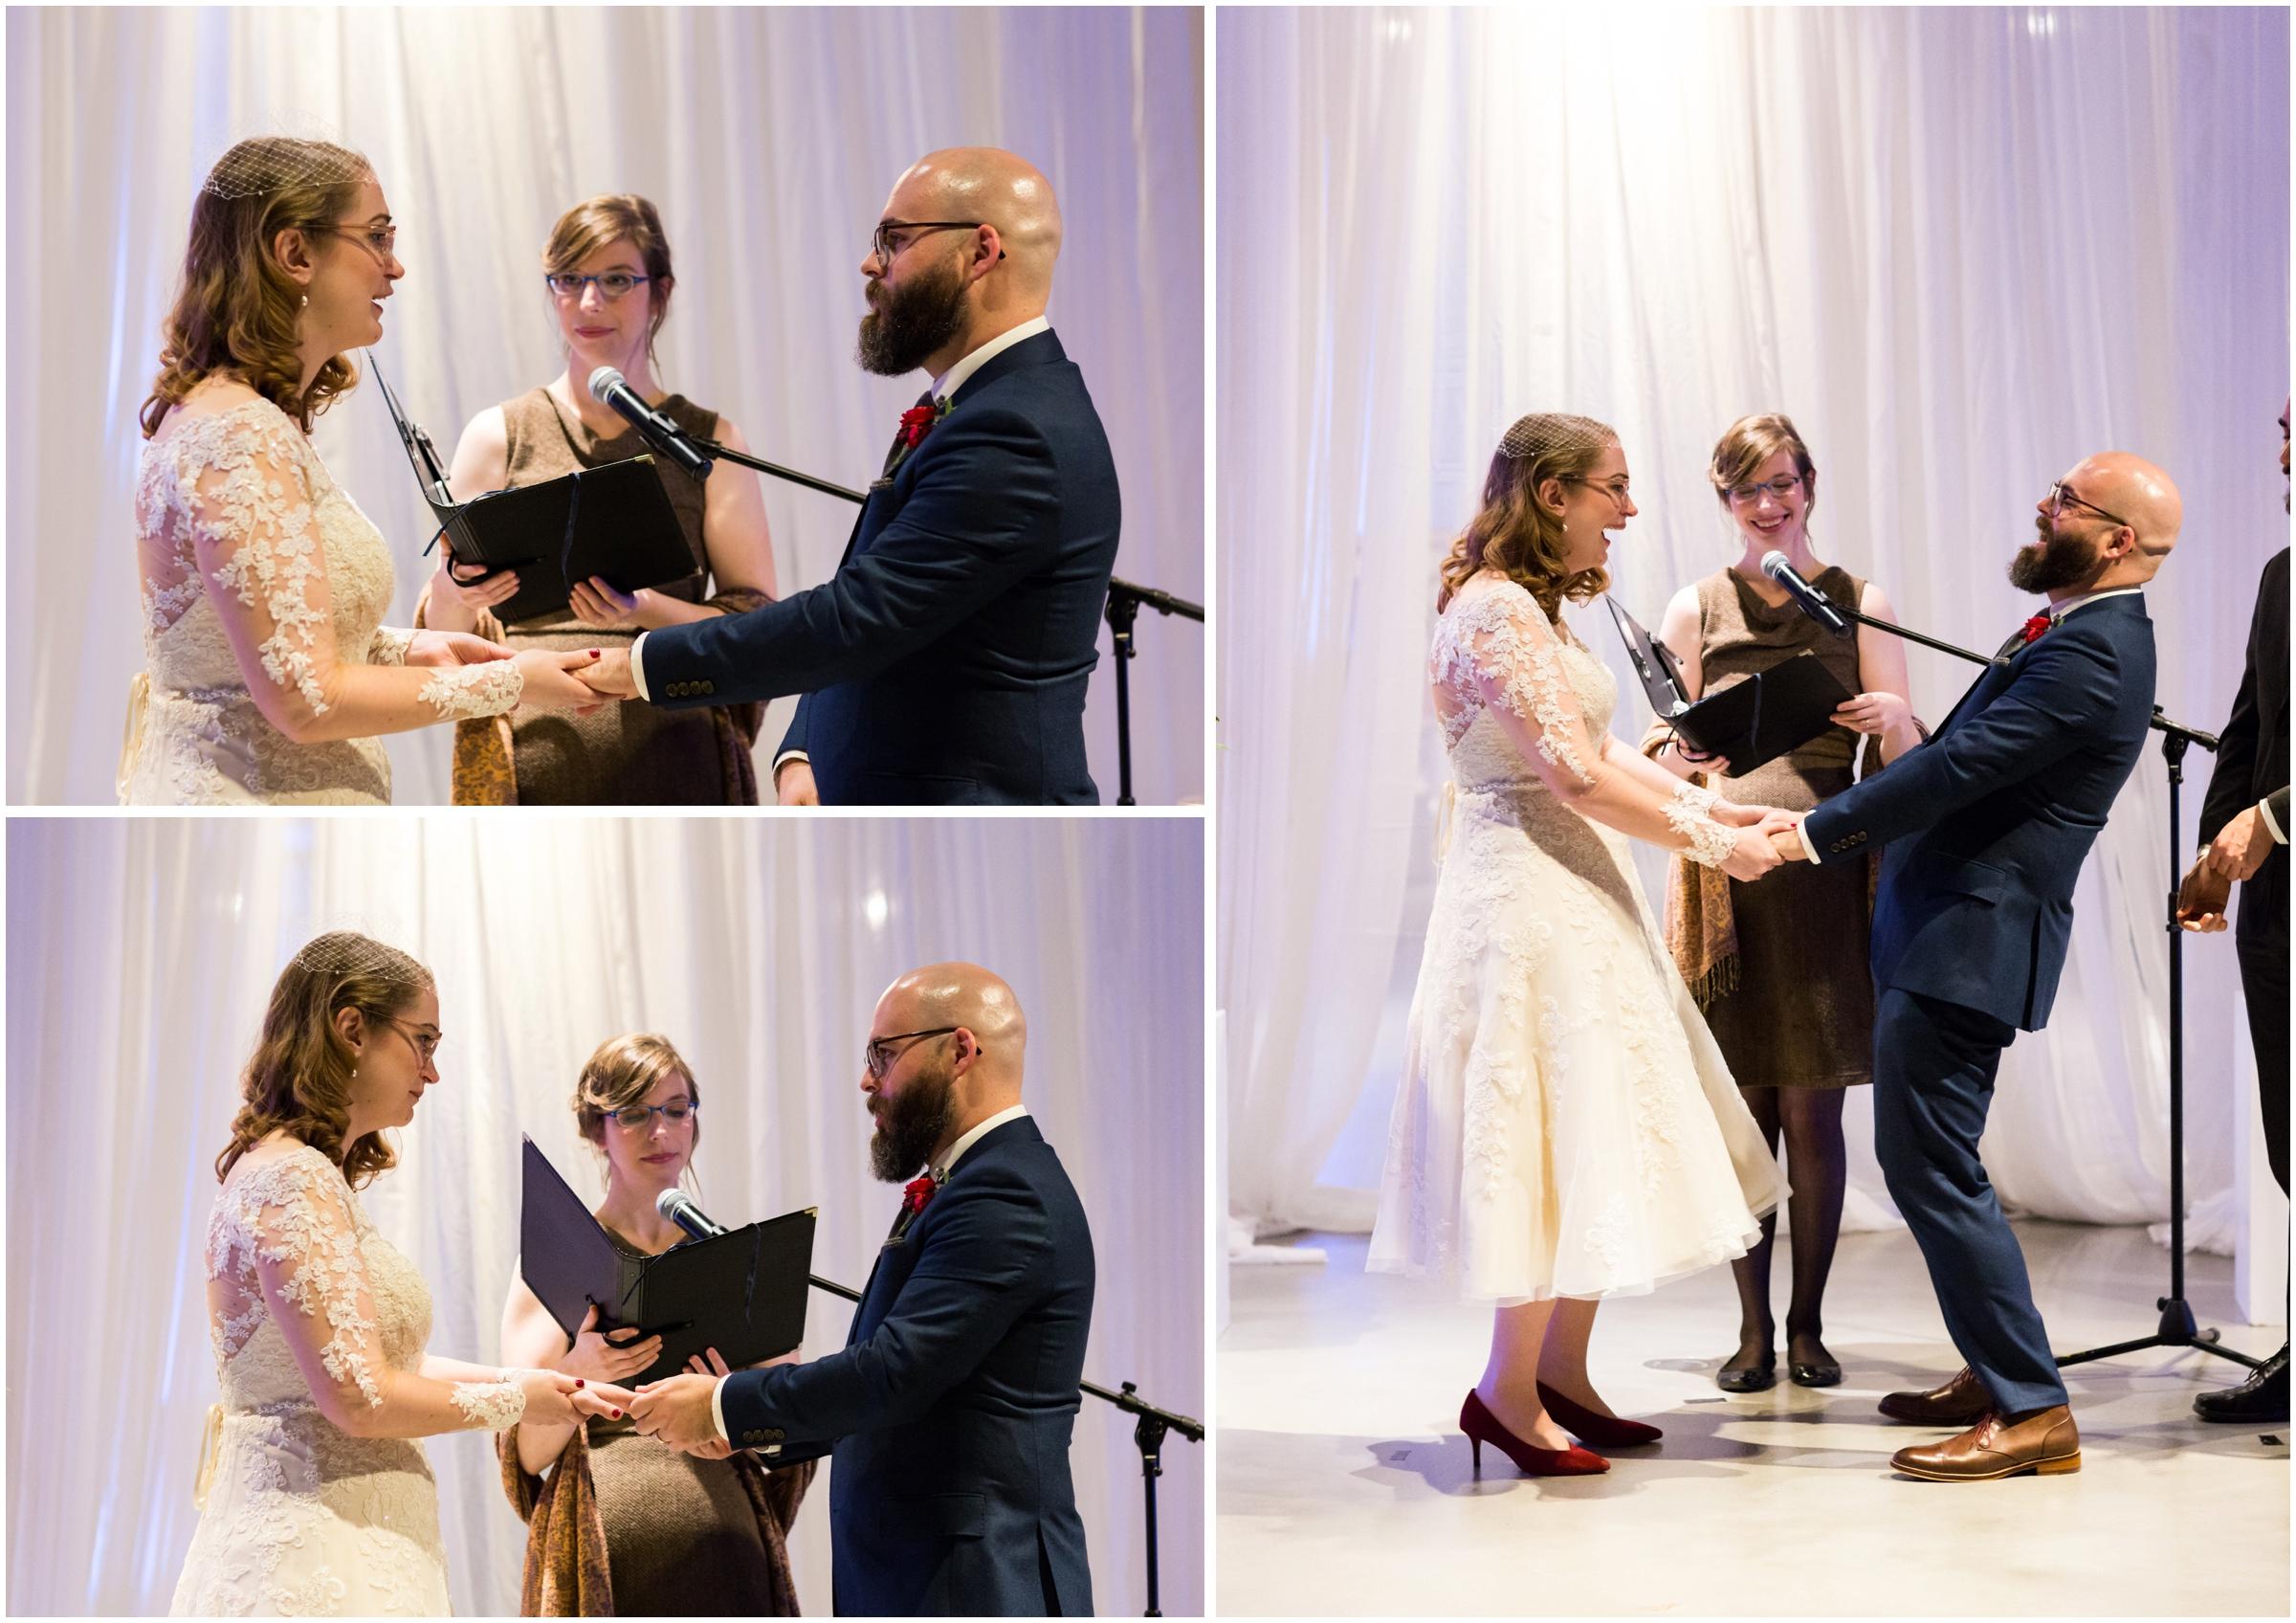 Ottaw Wedding Allison Andrew - (Selena Phillips-Boyle)_0075.jpg